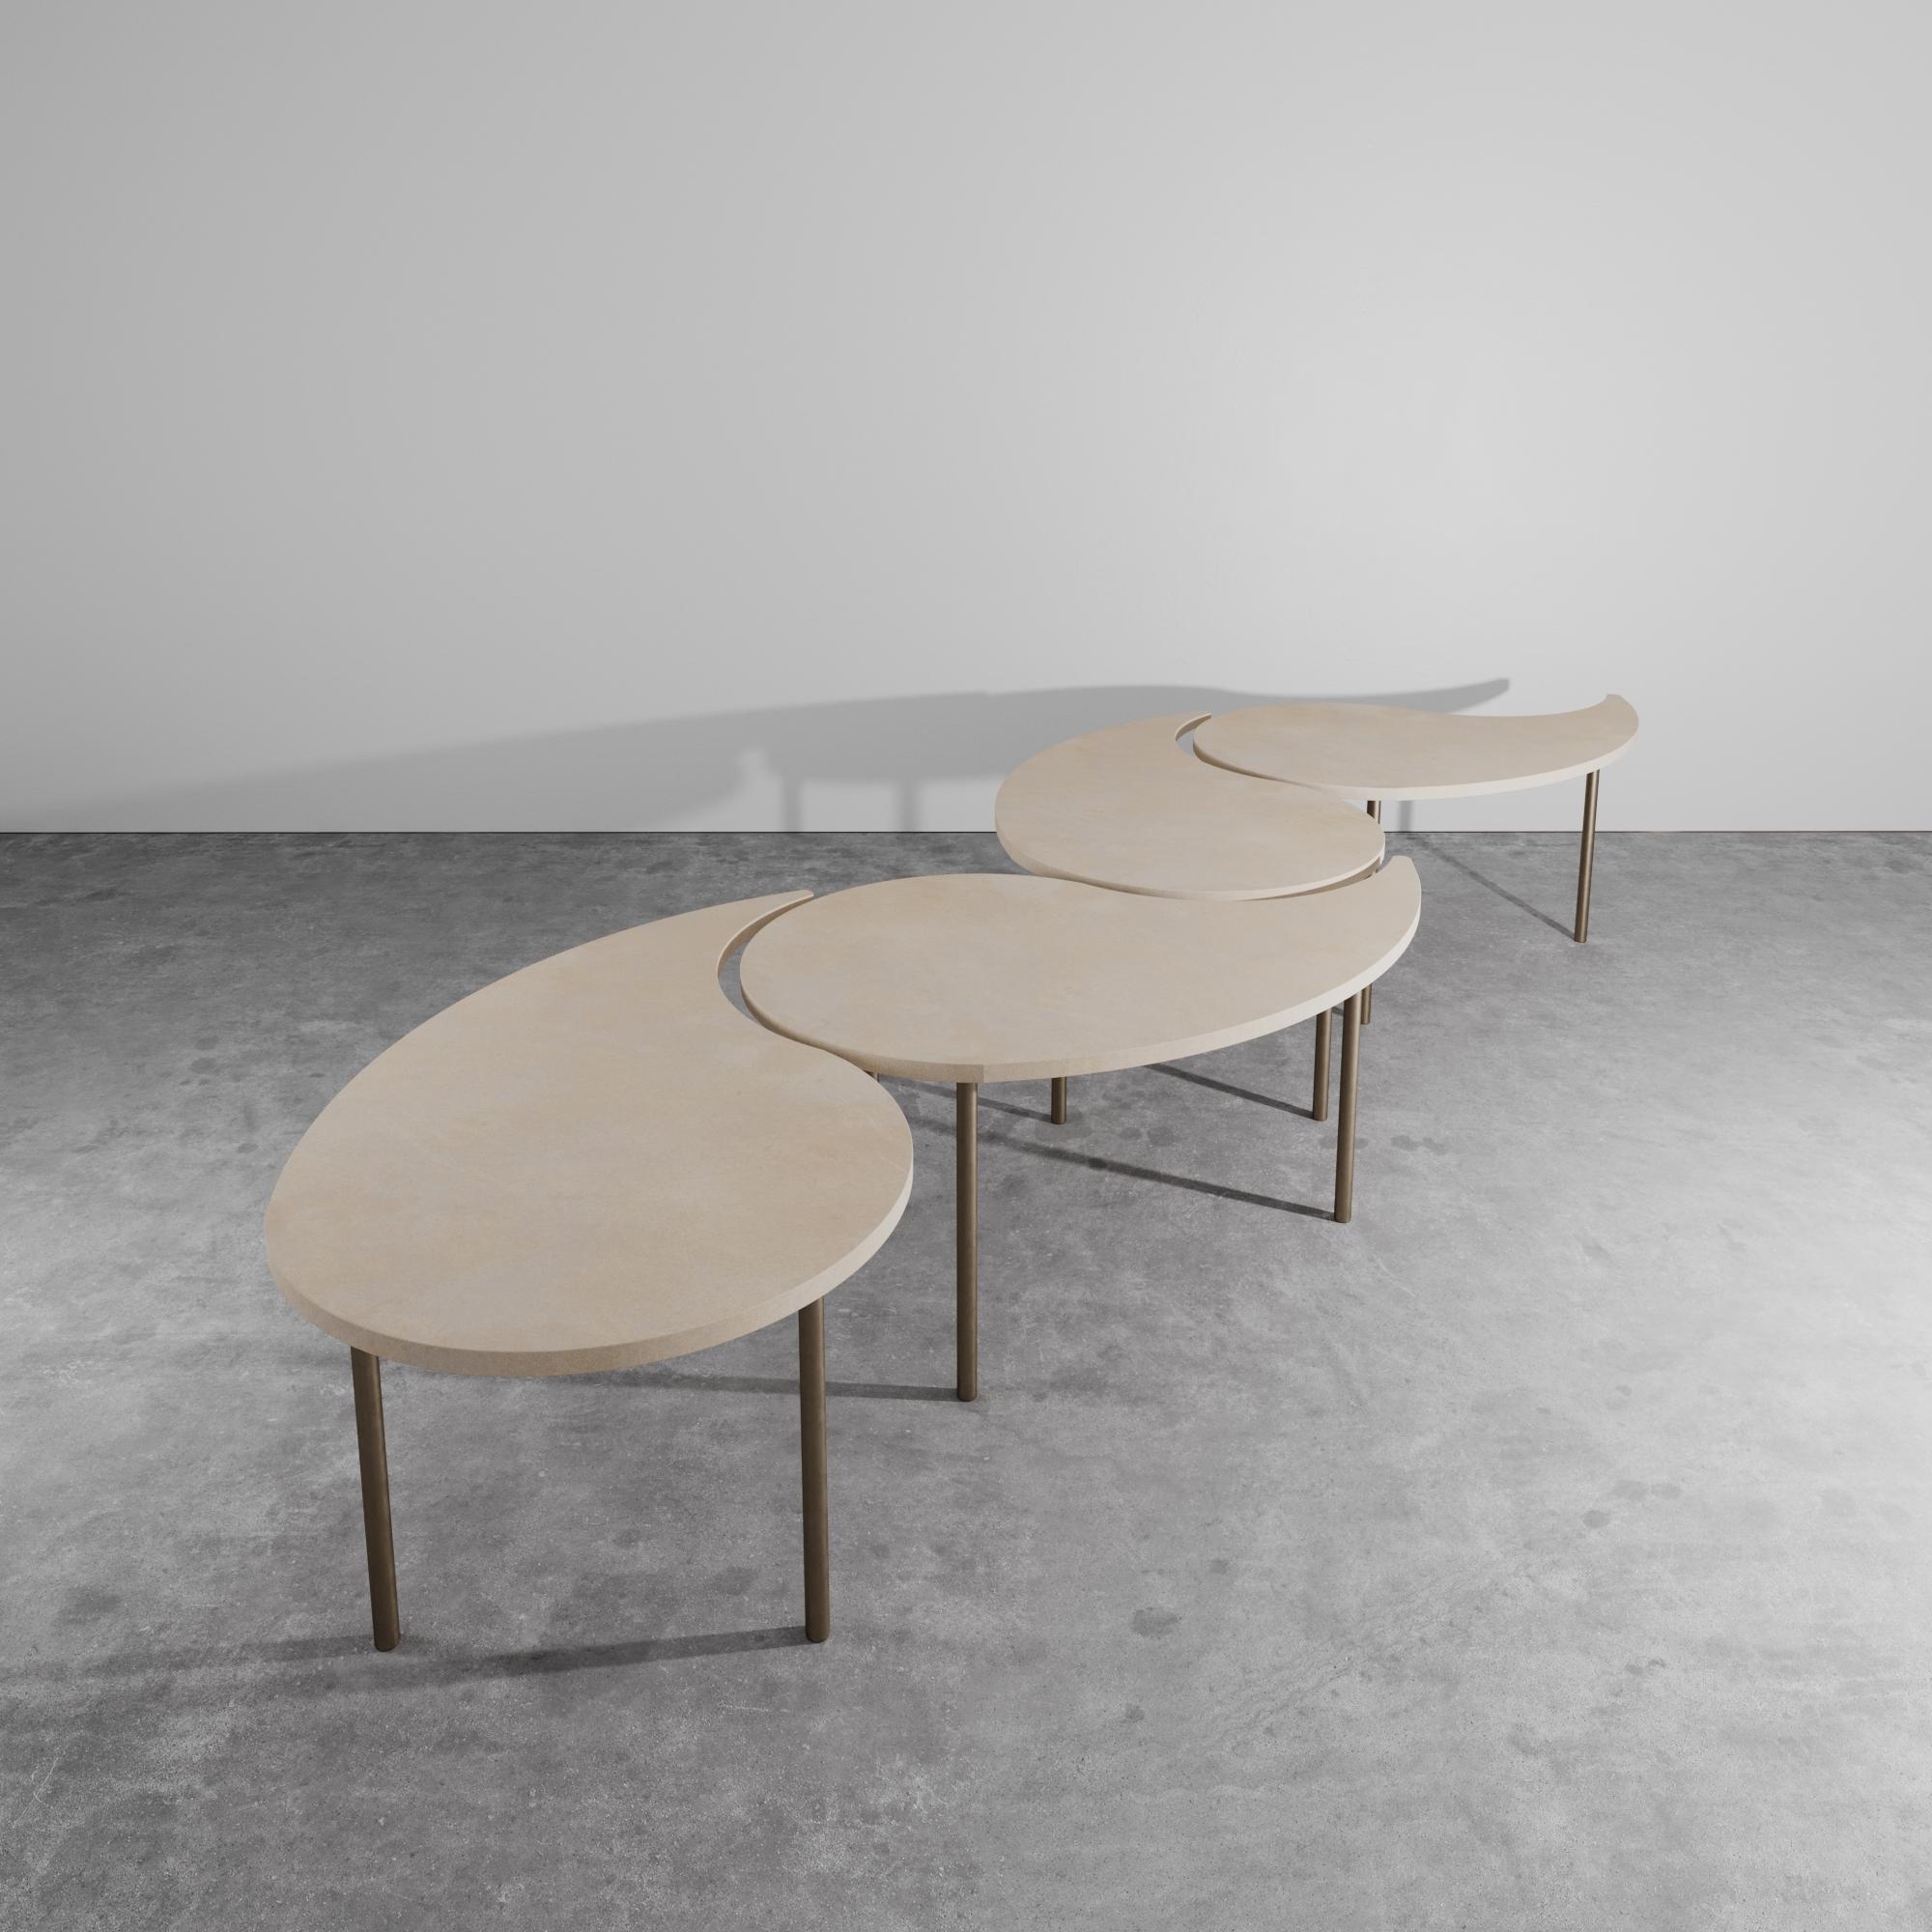 Capra Coffee Table - Aguirre Design